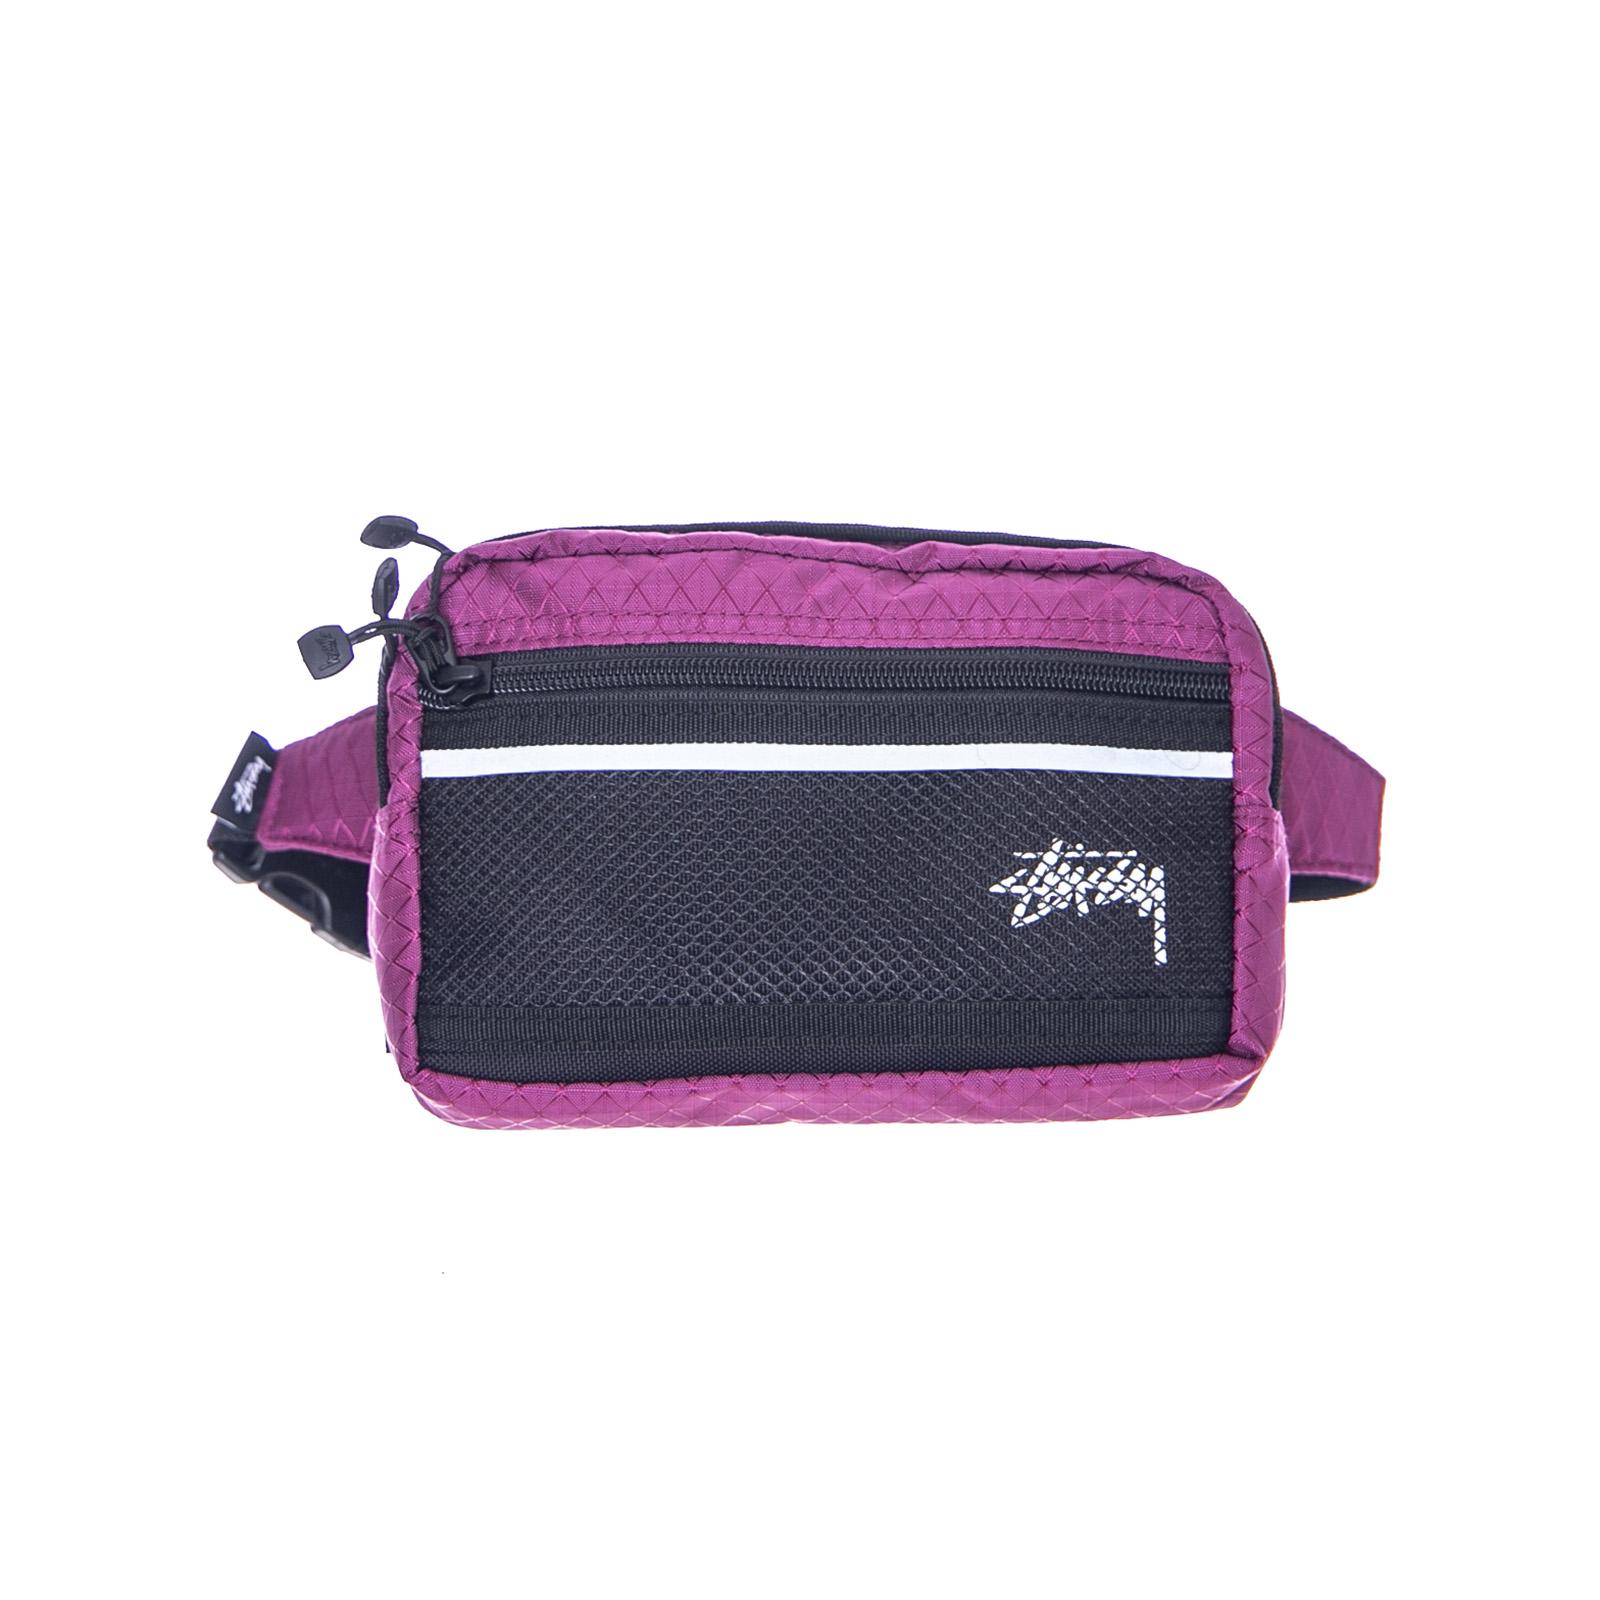 dbc22e91cc9 Stussy Diamond Ripstop Waist Bag Berry Violet | eBay